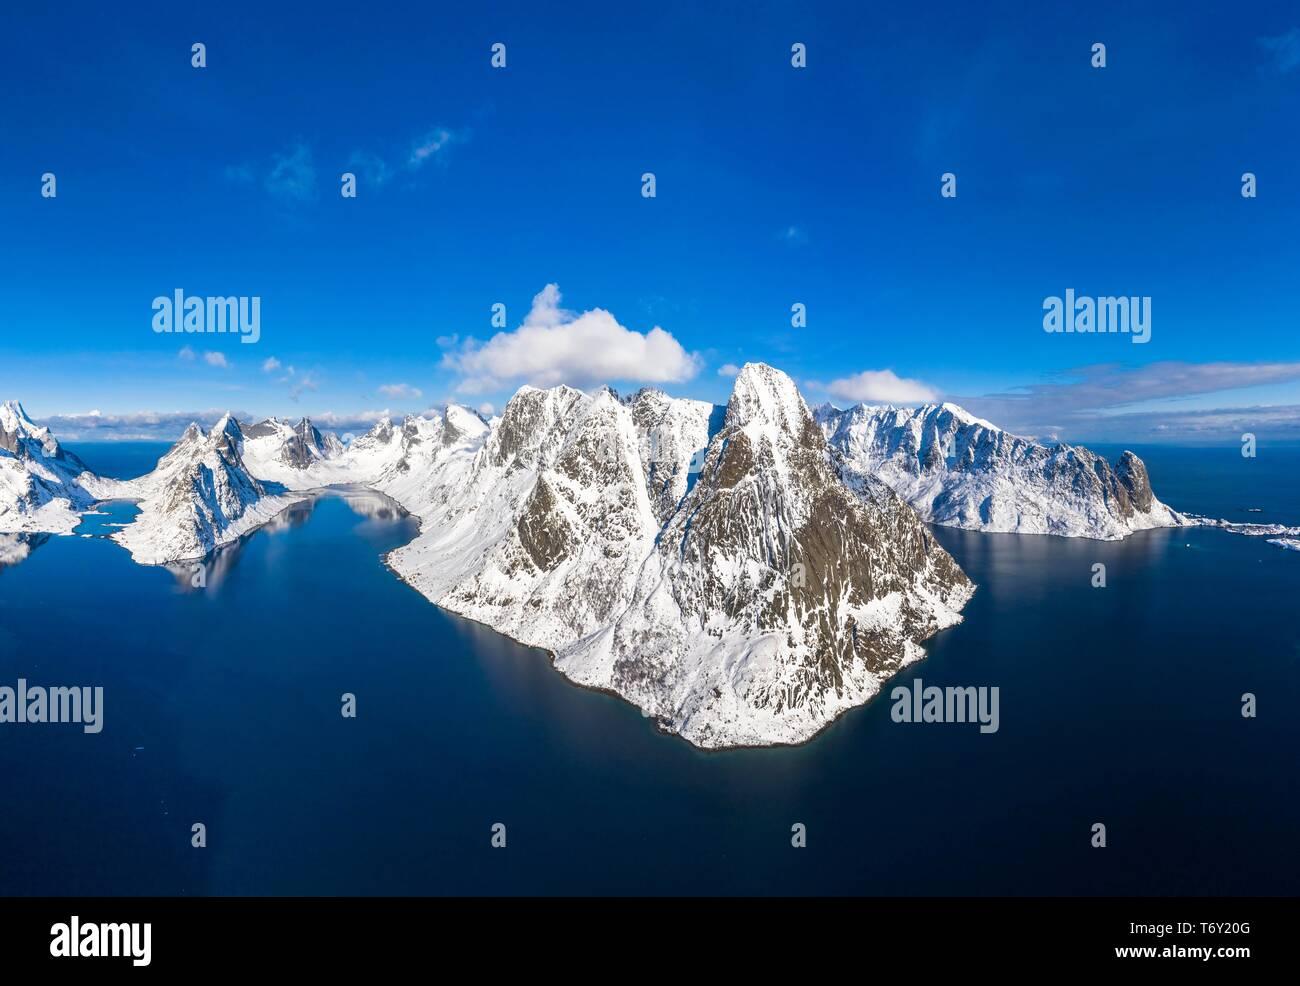 View of mountains and fjords near Reinebringen, Olstinden, Moskenesoya, Lofoten, Norway - Stock Image